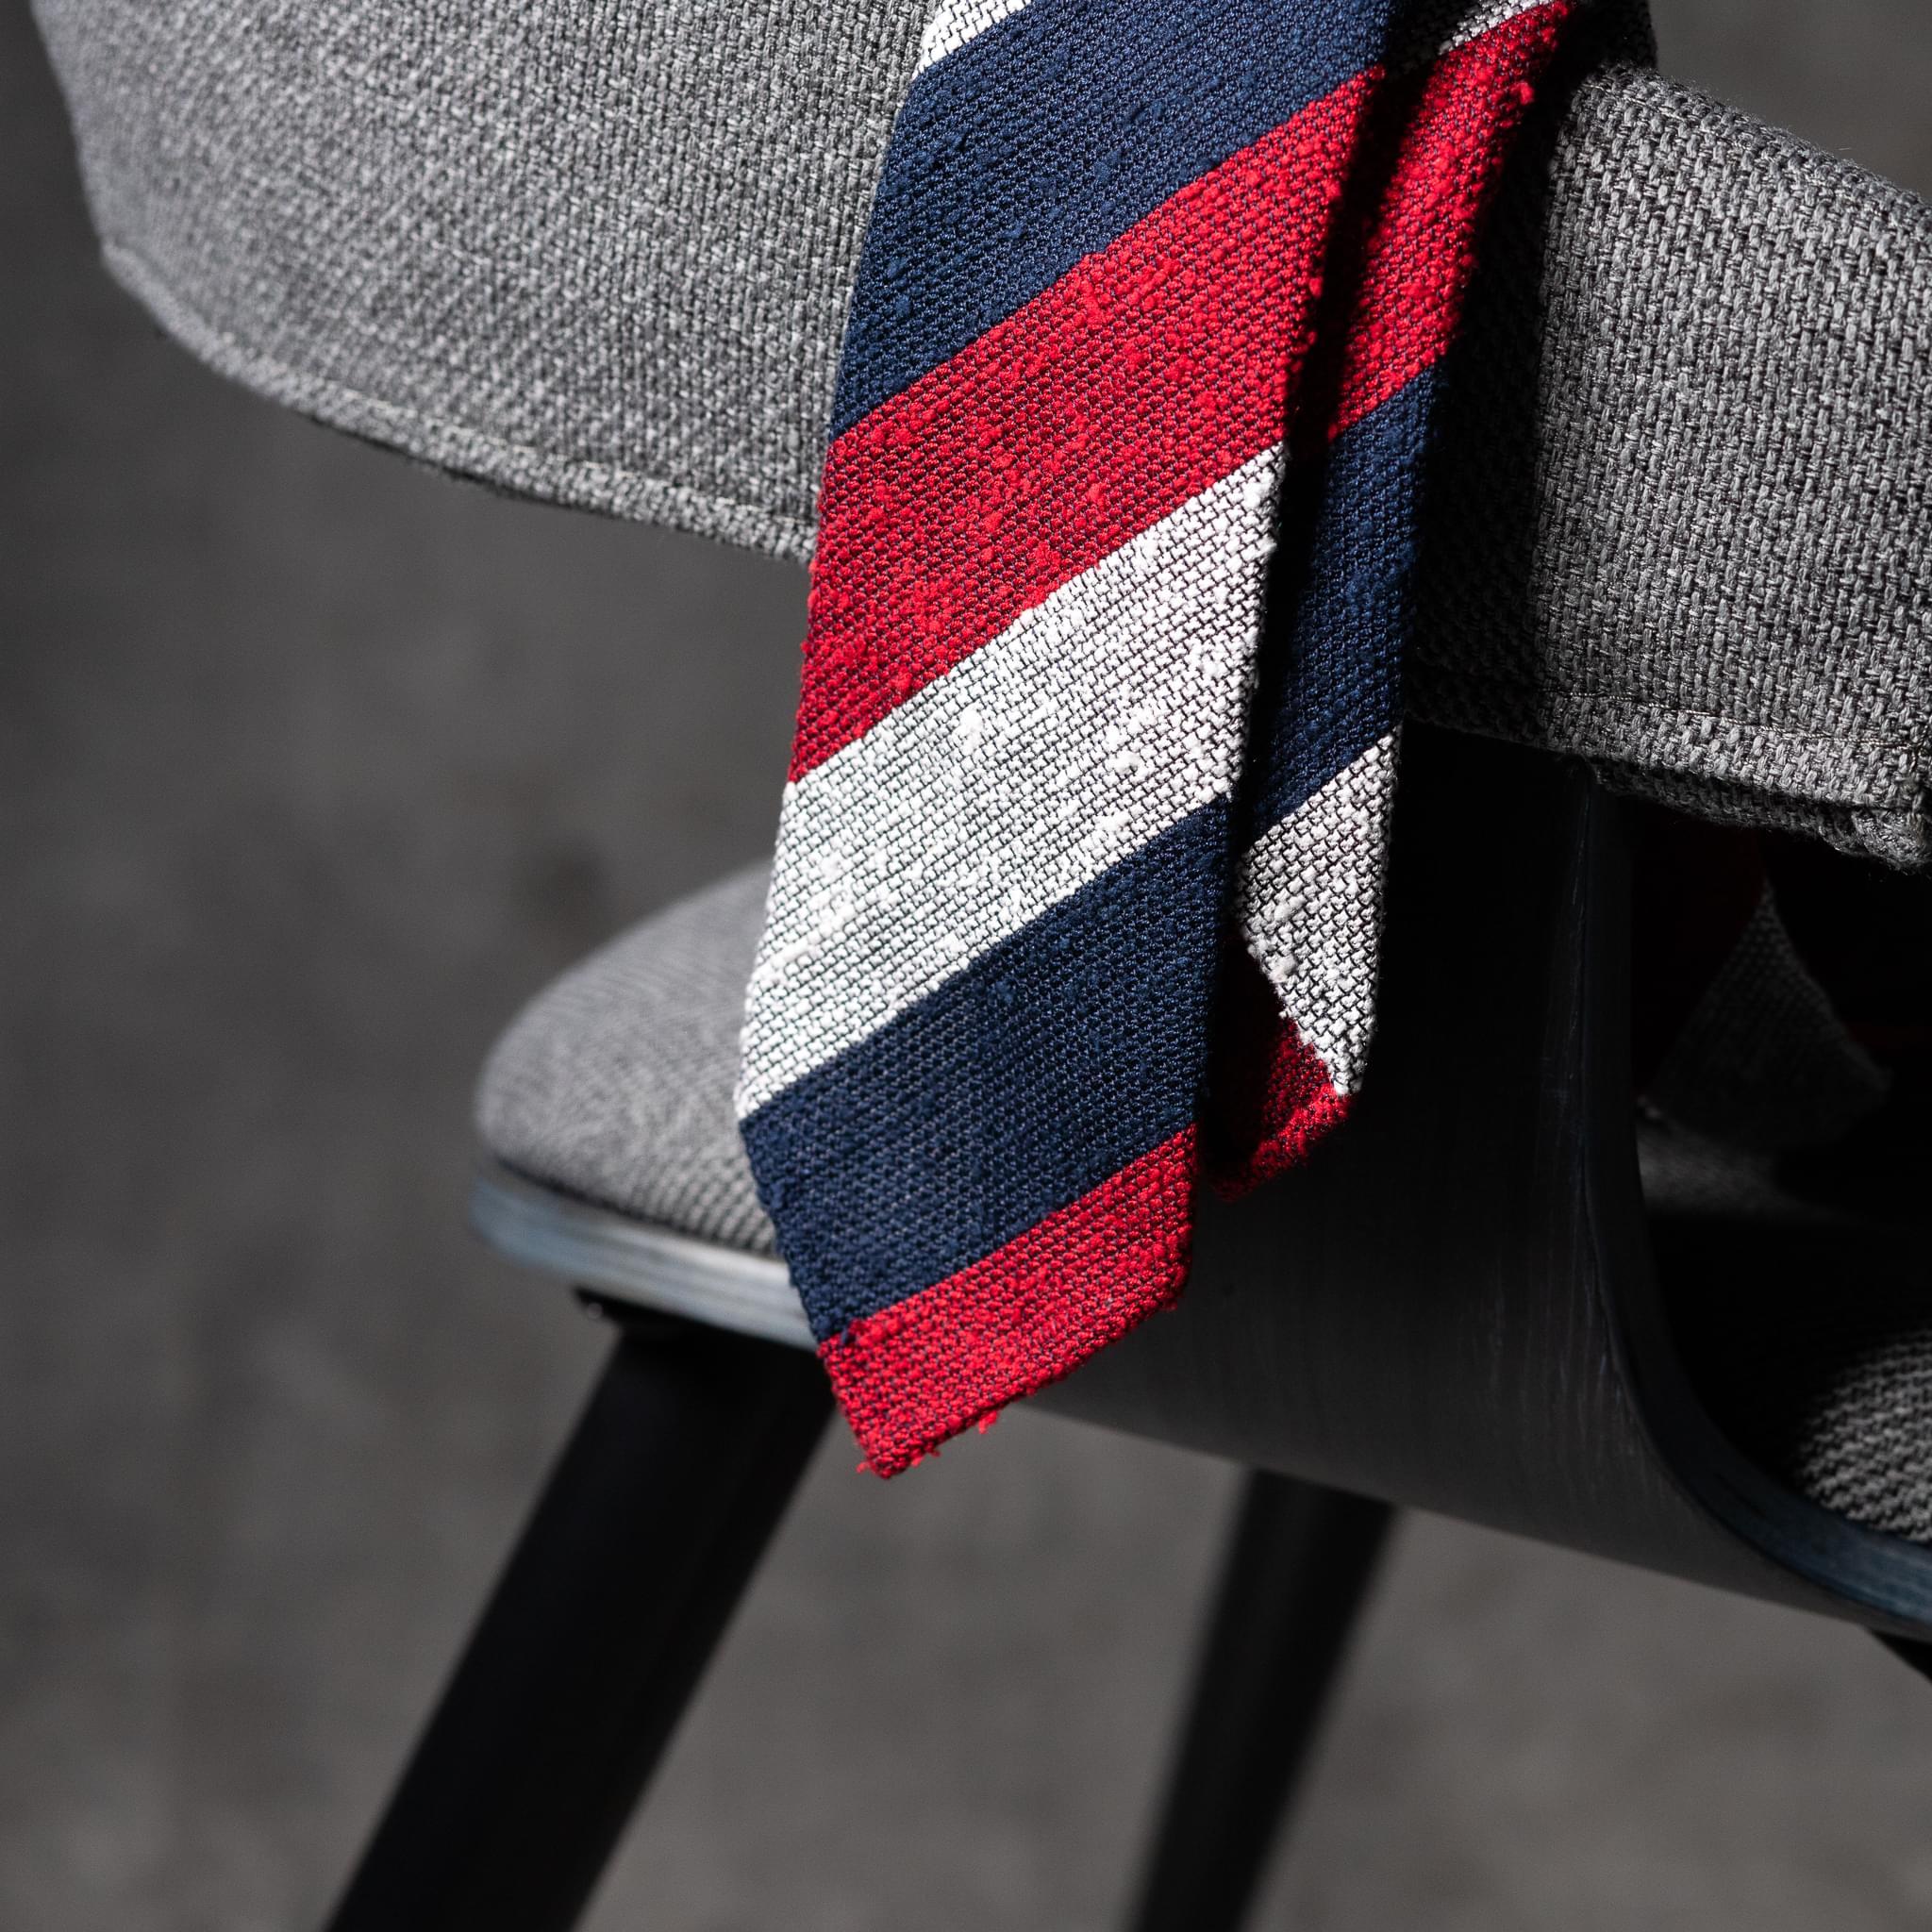 SHANTUNG-0524-Tie-Initials-Corbata-Iniciales-The-Seelk-2